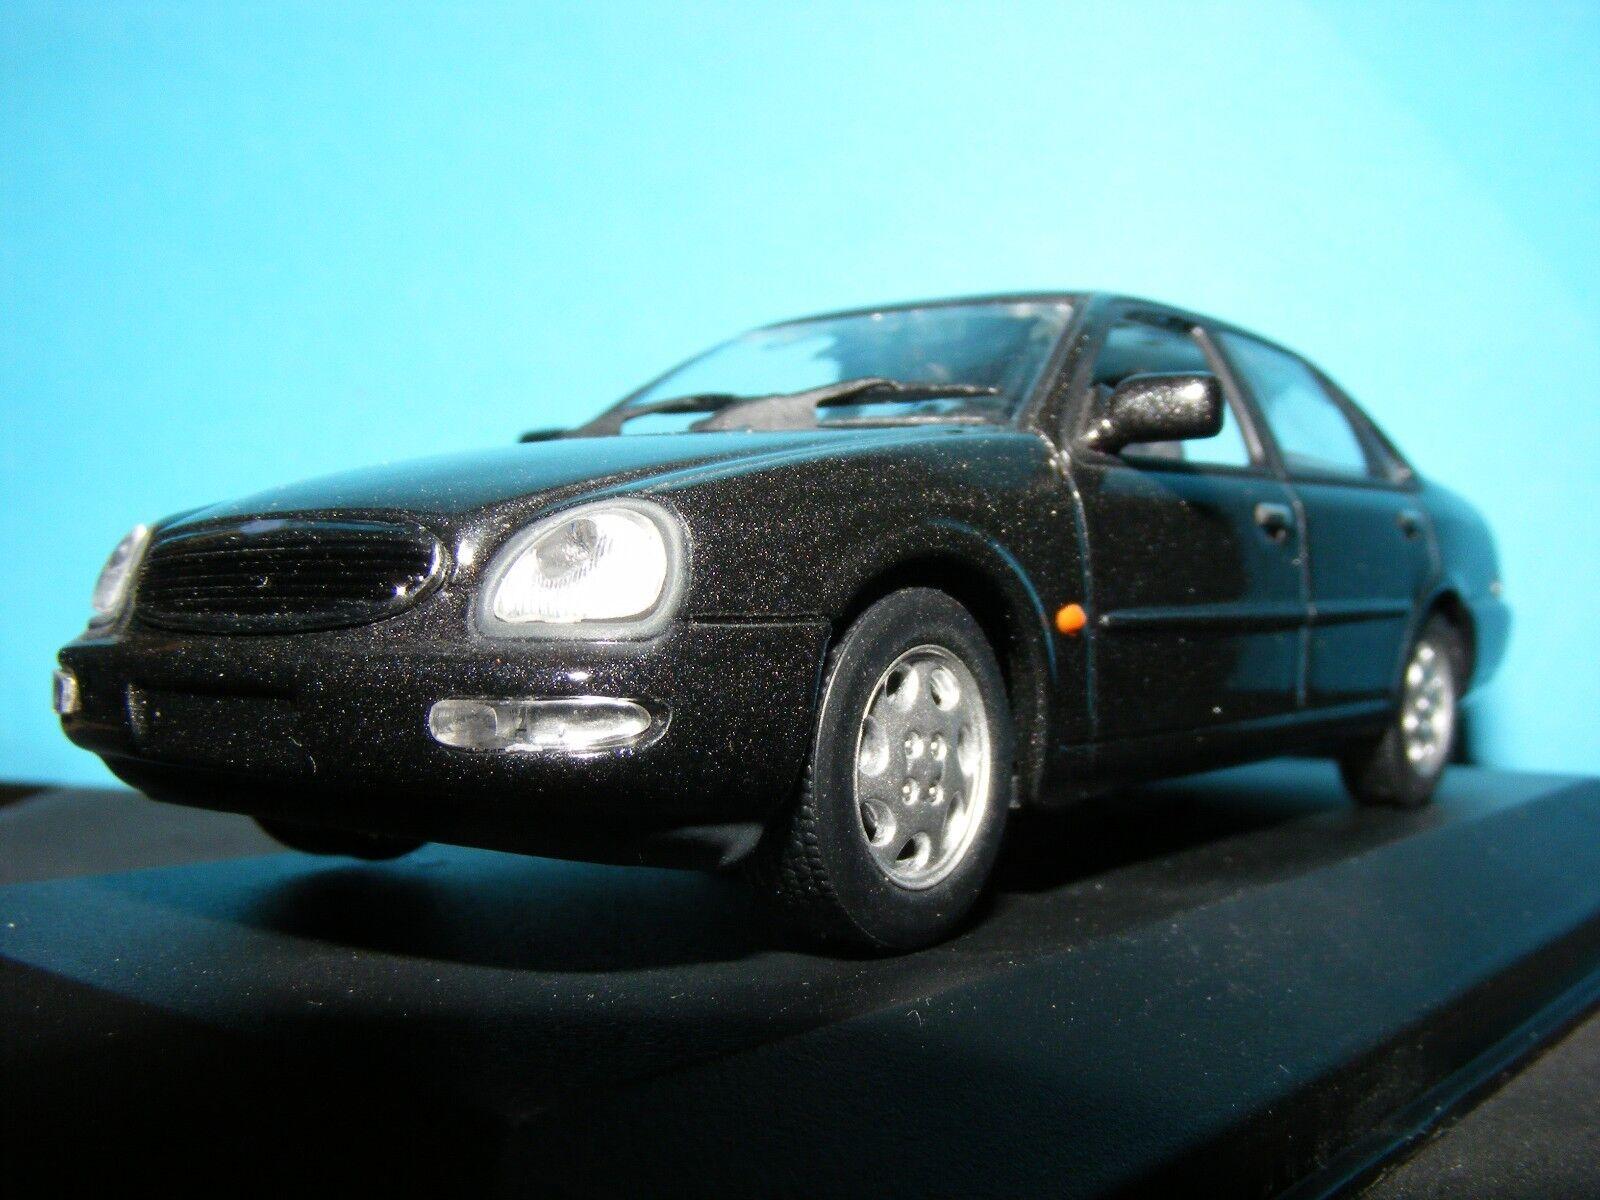 Ford Scorpio Granada 1995 1995 1995 Raro Minichamps nla en caja exterior gris 1 43rd Nuevo elemento f56d49